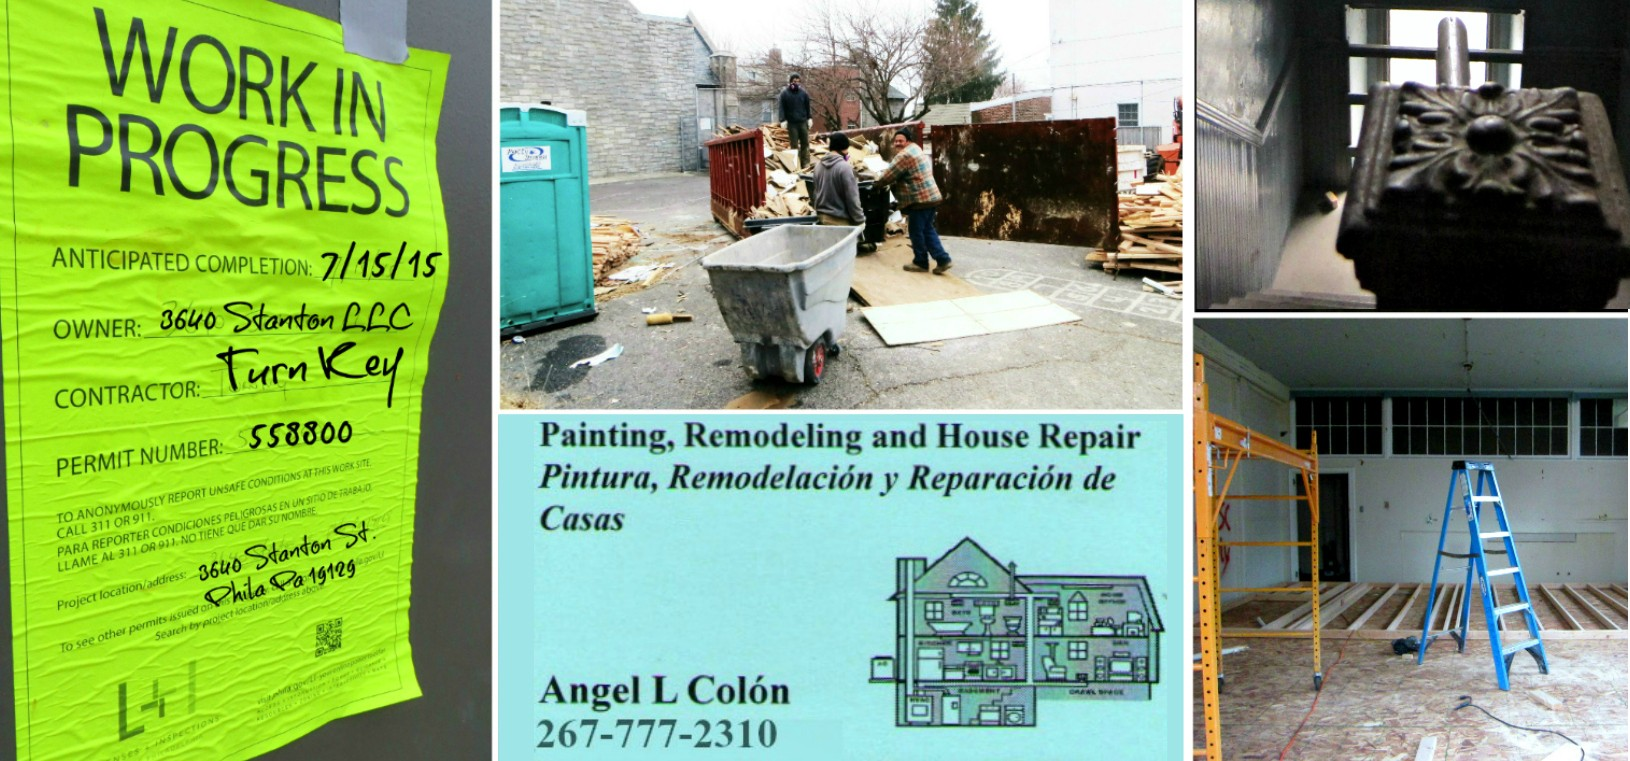 EastFallsLocal workinprogress collage